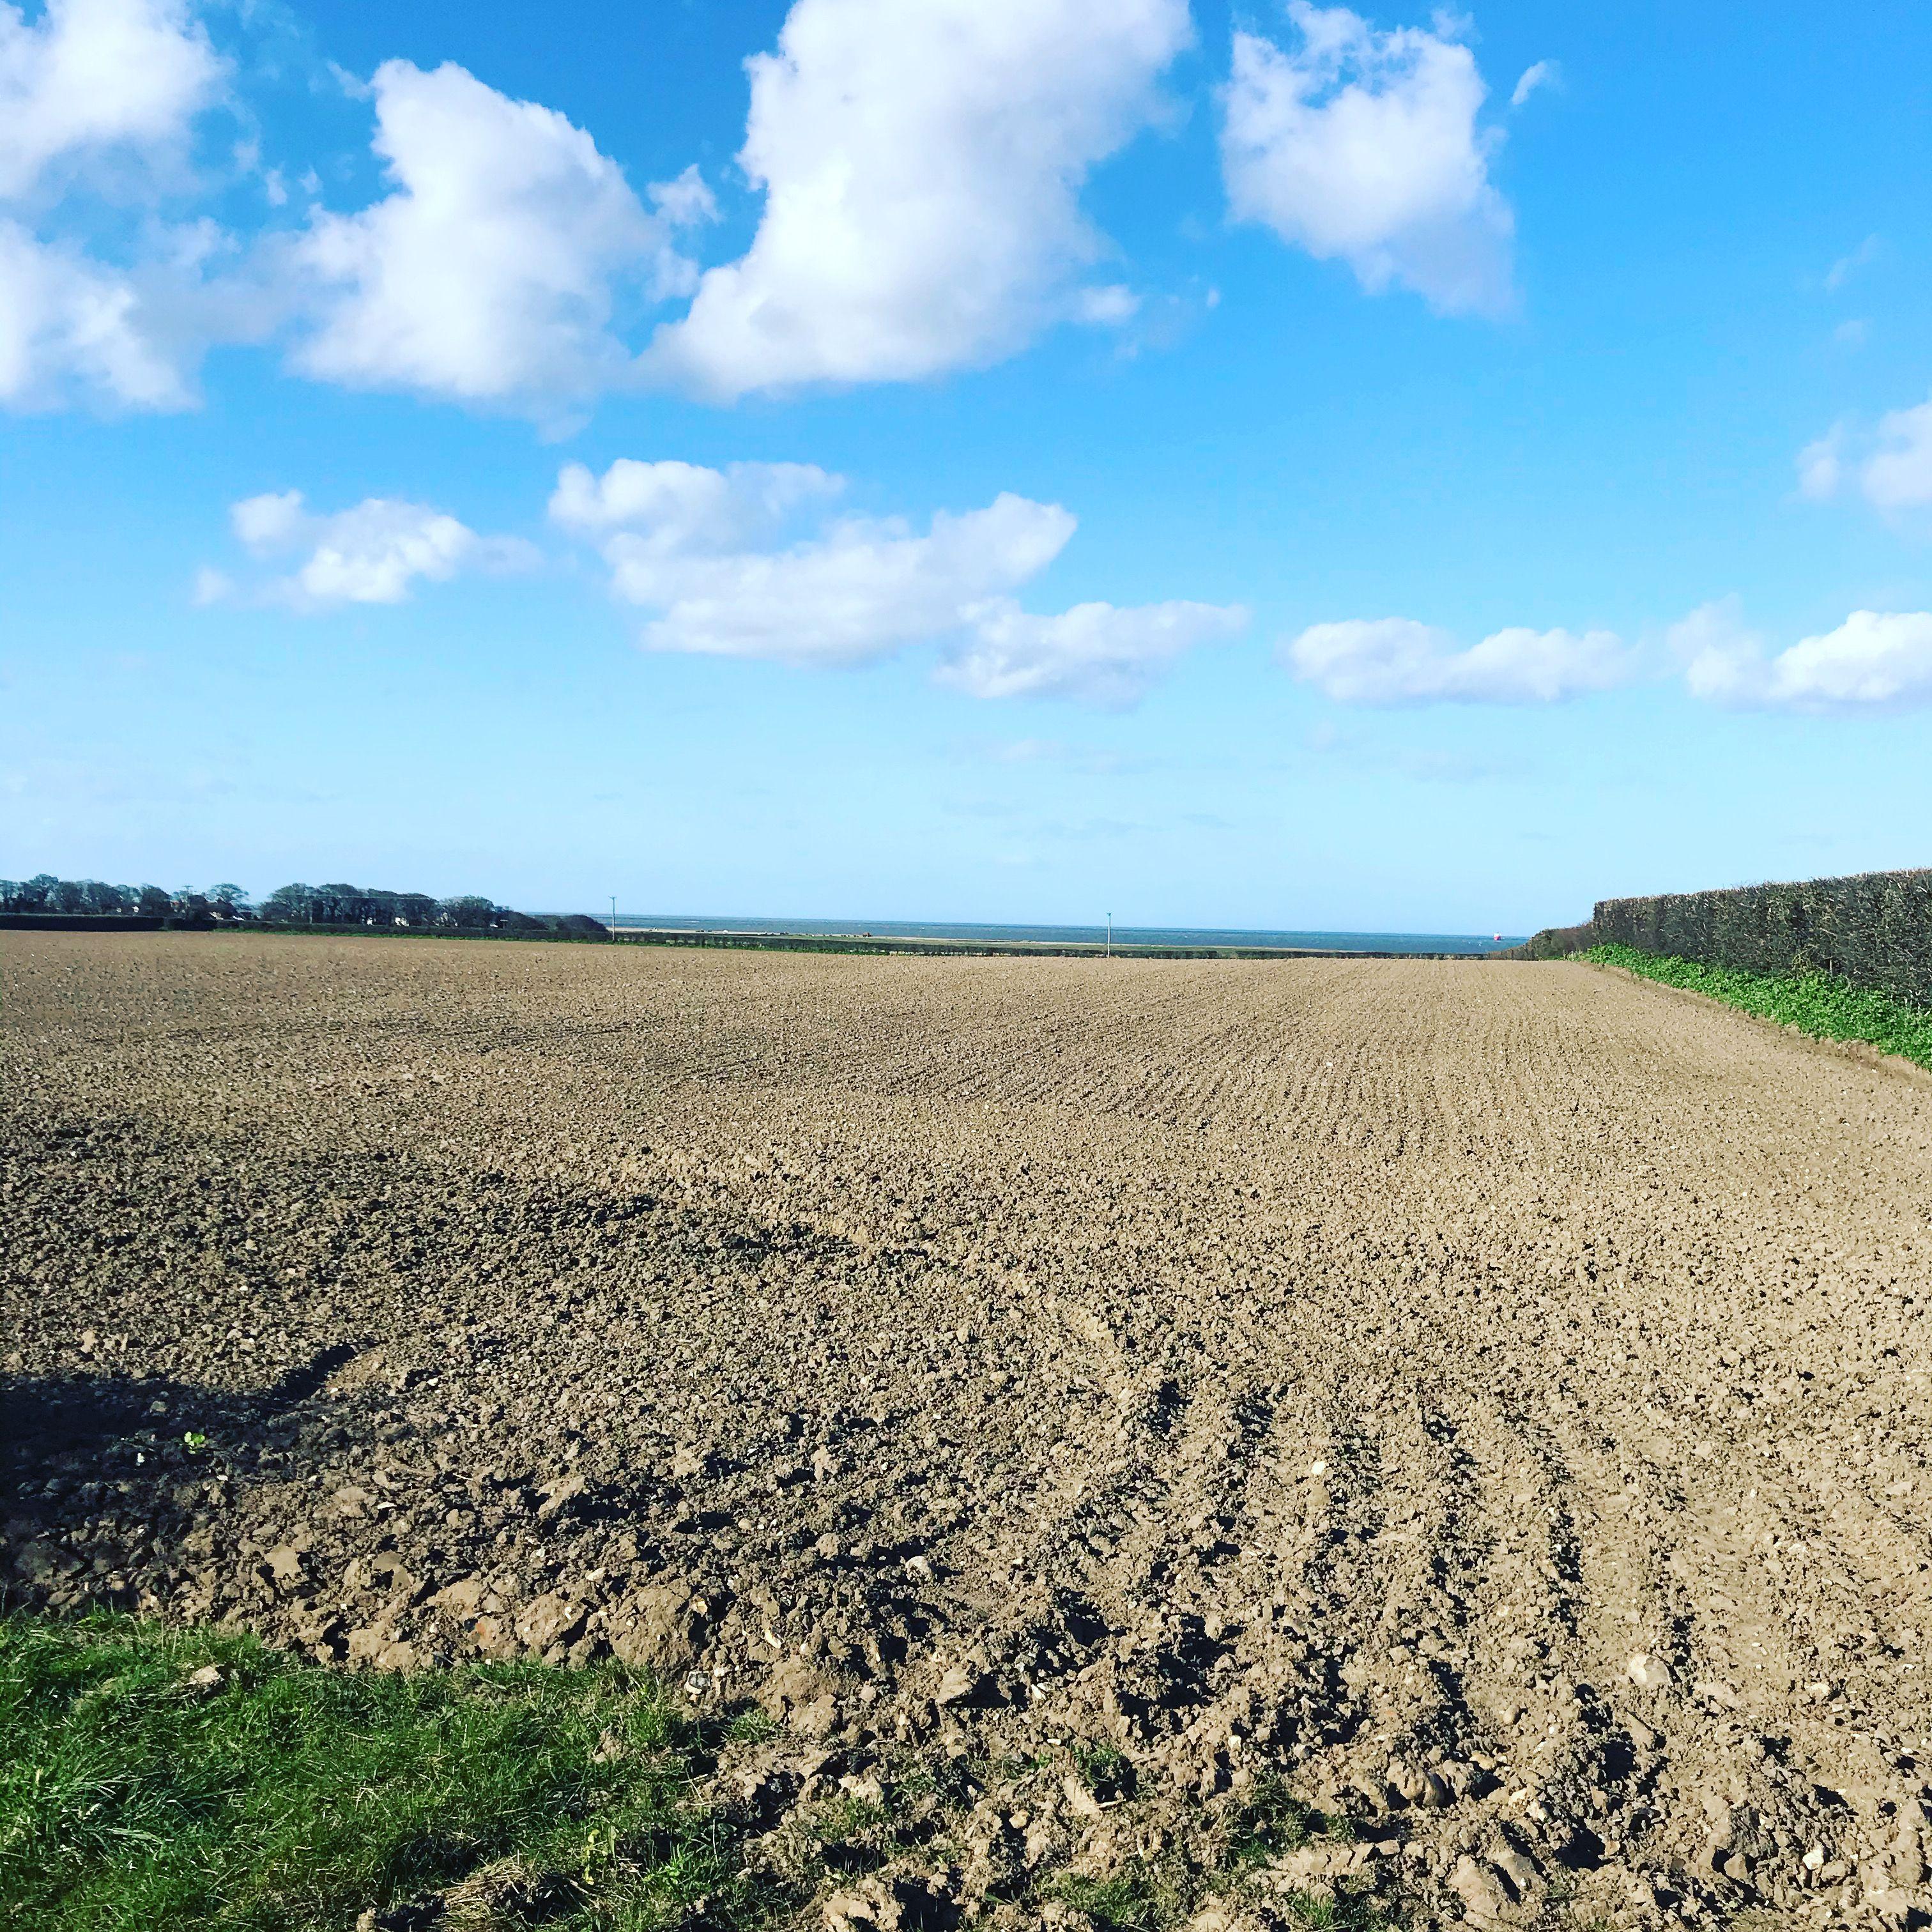 Barn drift wild in 2020 | Norfolk coast, Glamping site ...